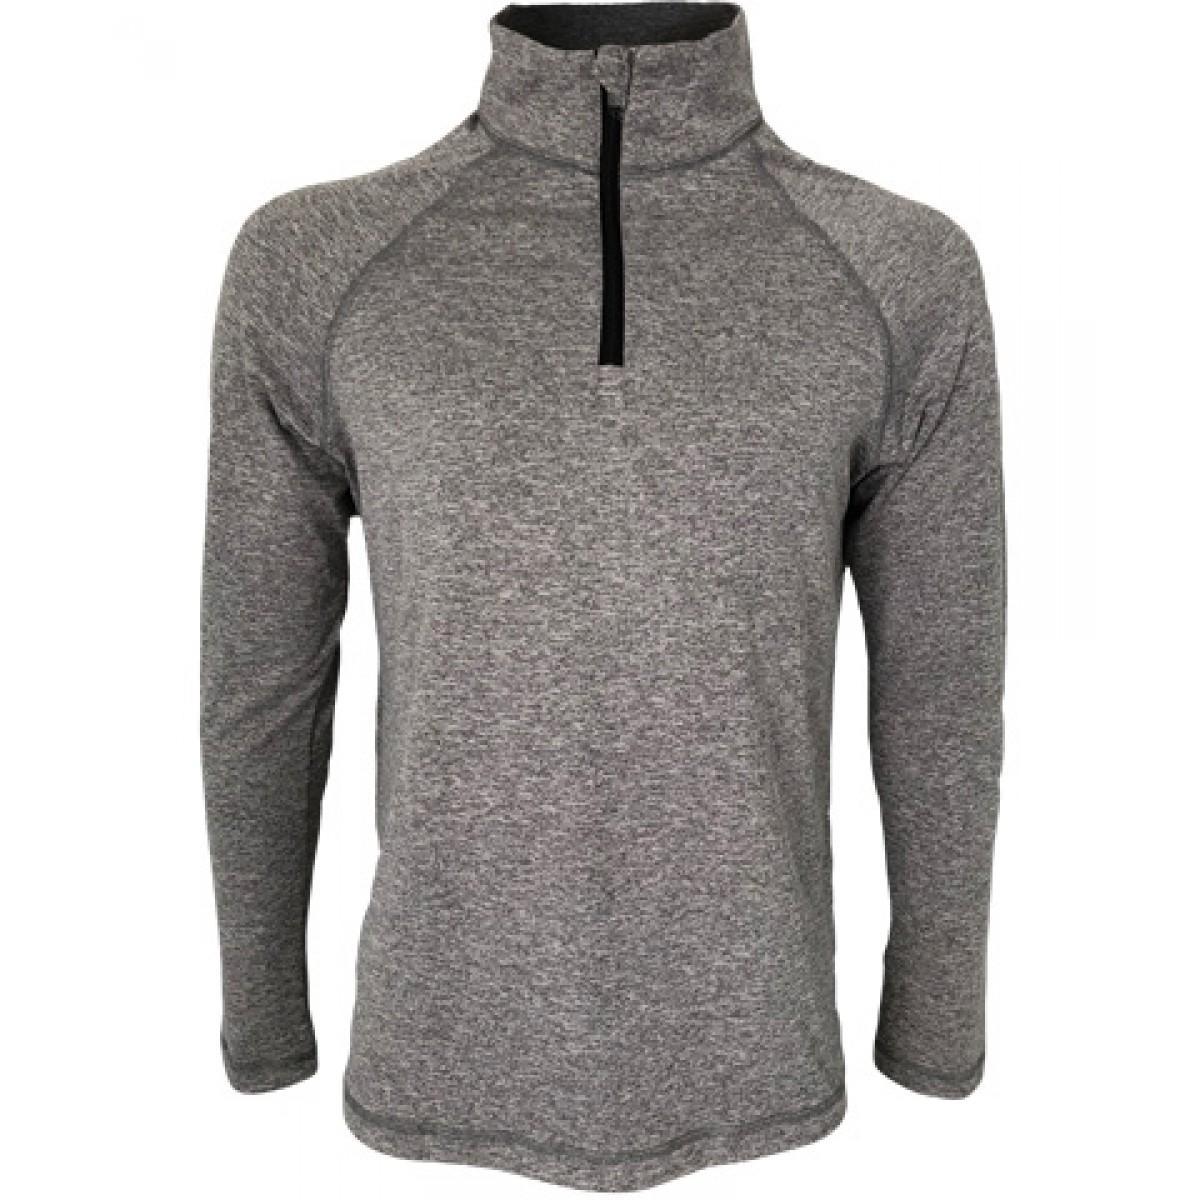 Men's Quarter-Zip Lightweight Pullover-Gray -L